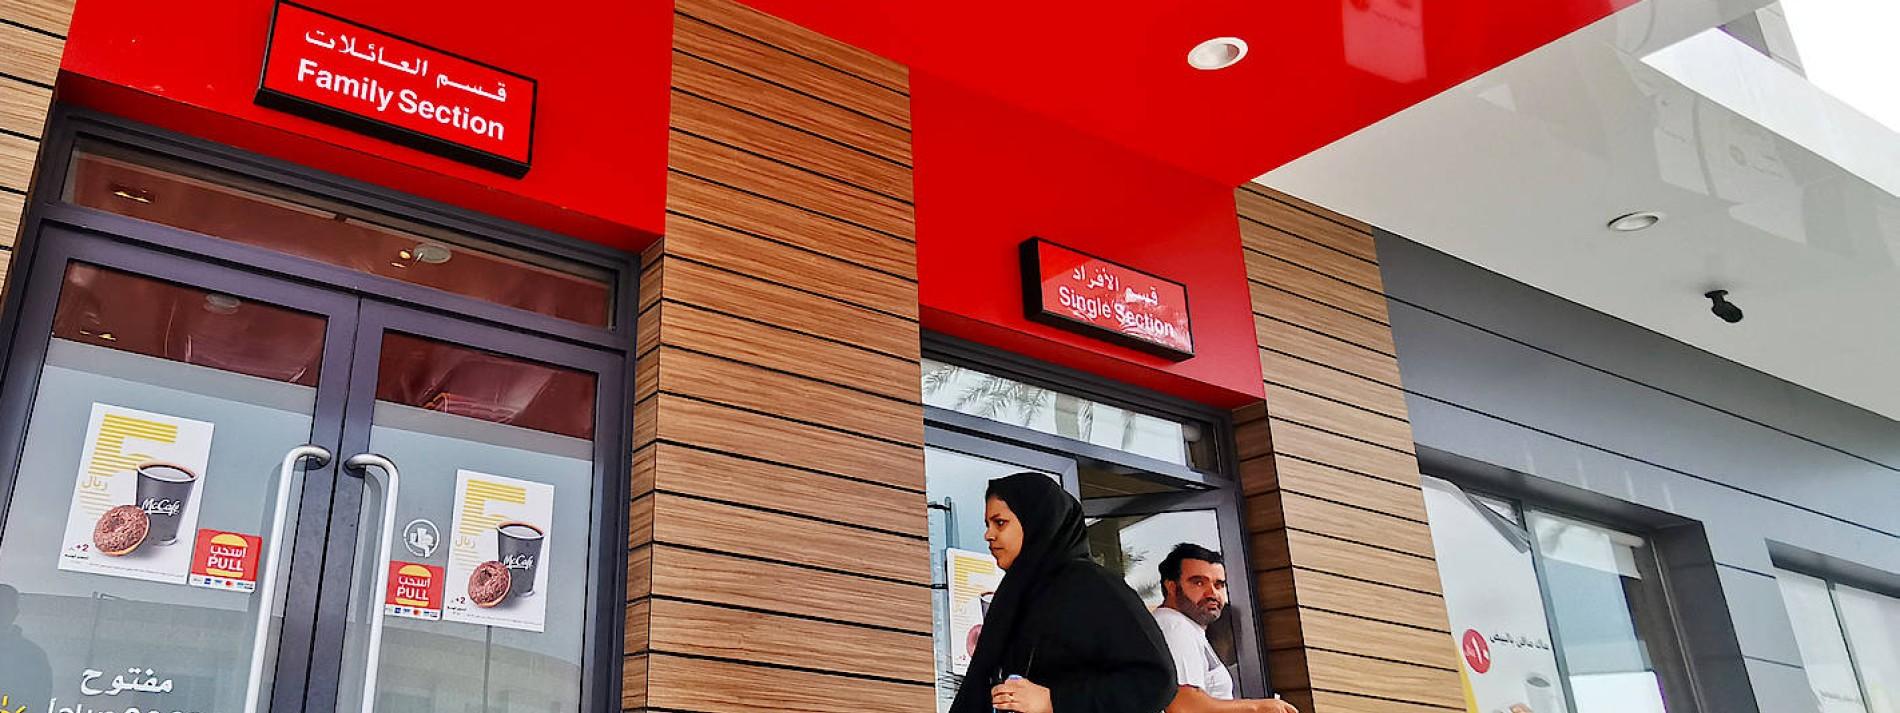 Saudi-Arabien beendet Geschlechtertrennung in Eingängen